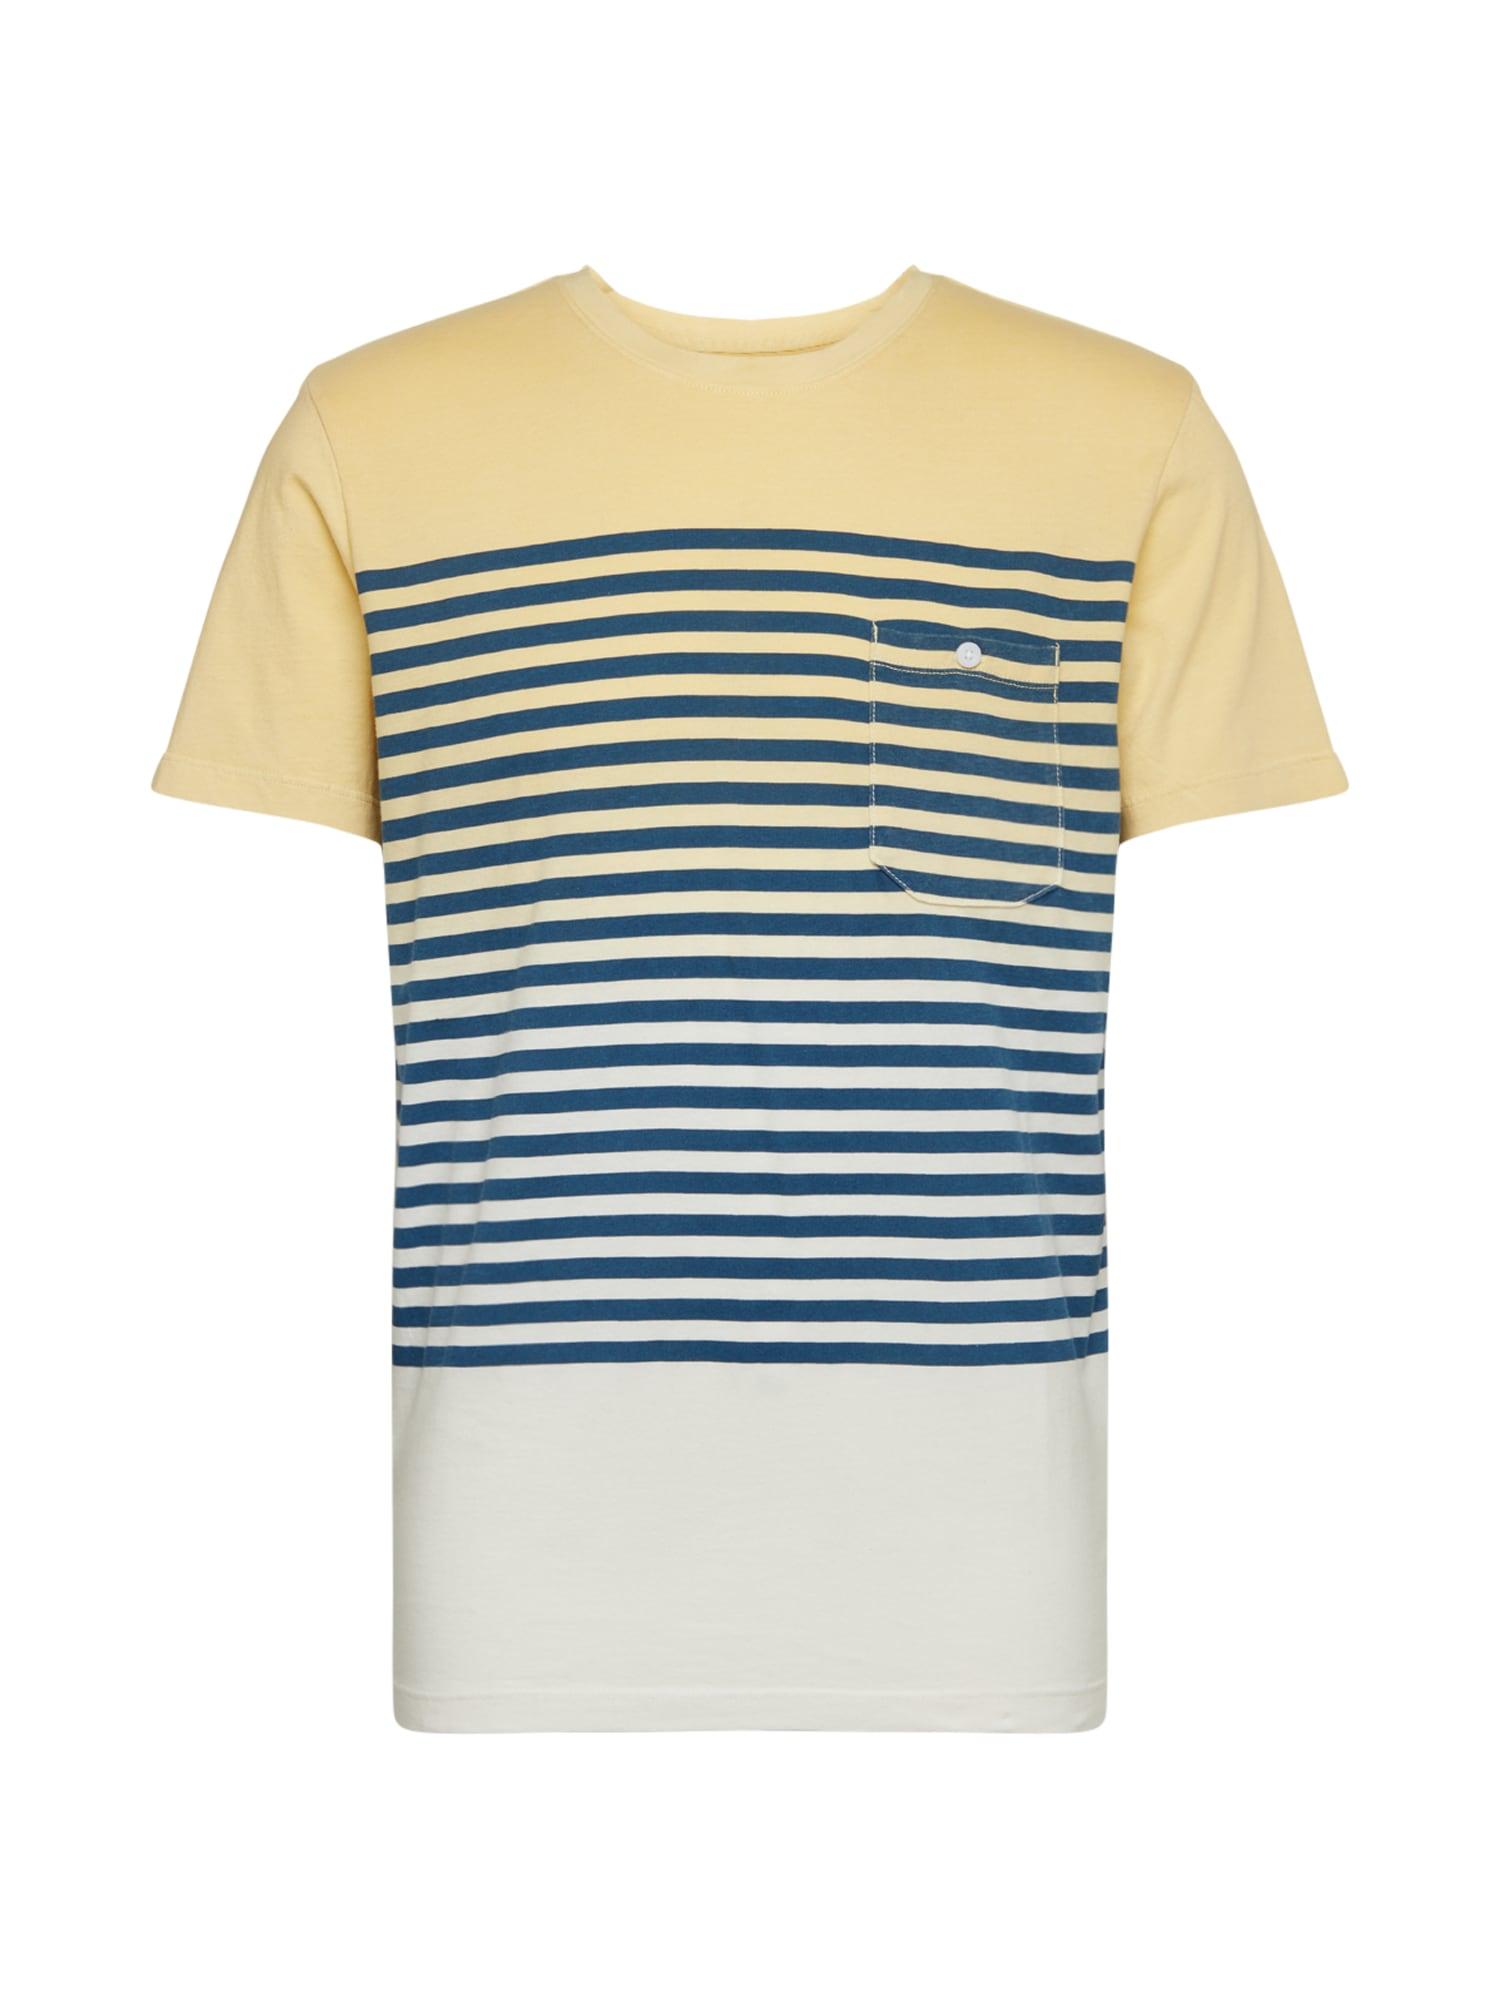 JACK & JONES Marškinėliai mėlyna / geltona